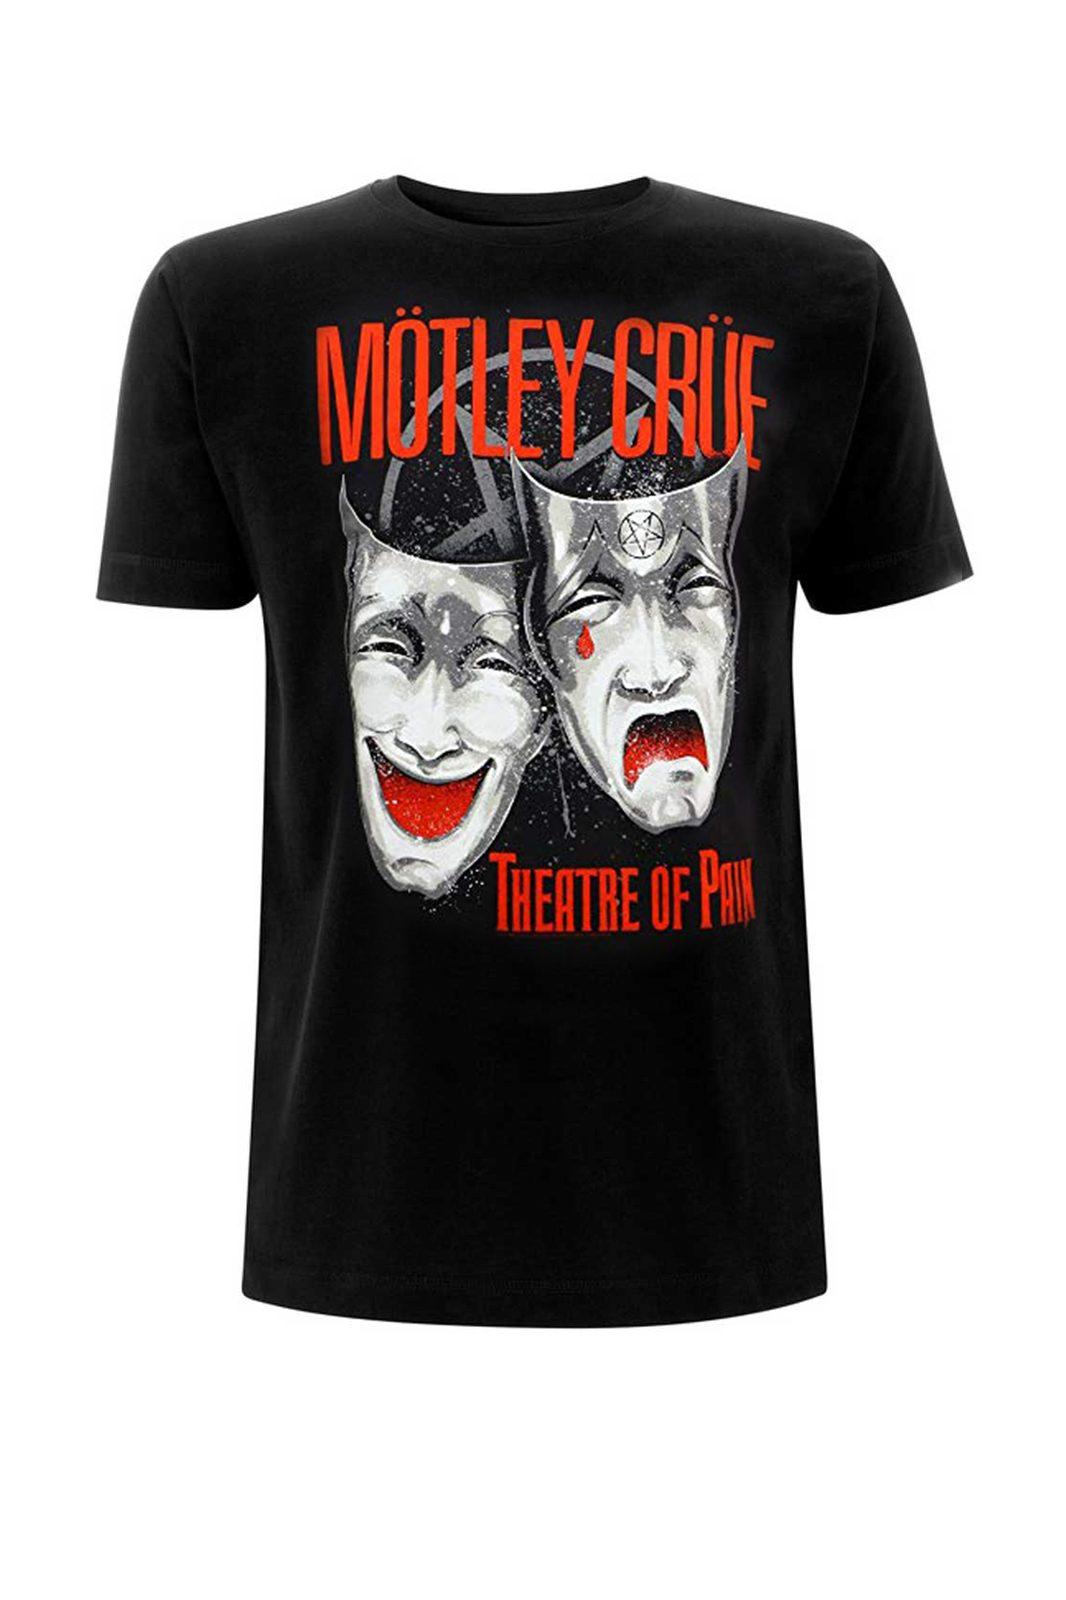 Tee Mötley Crüe Black